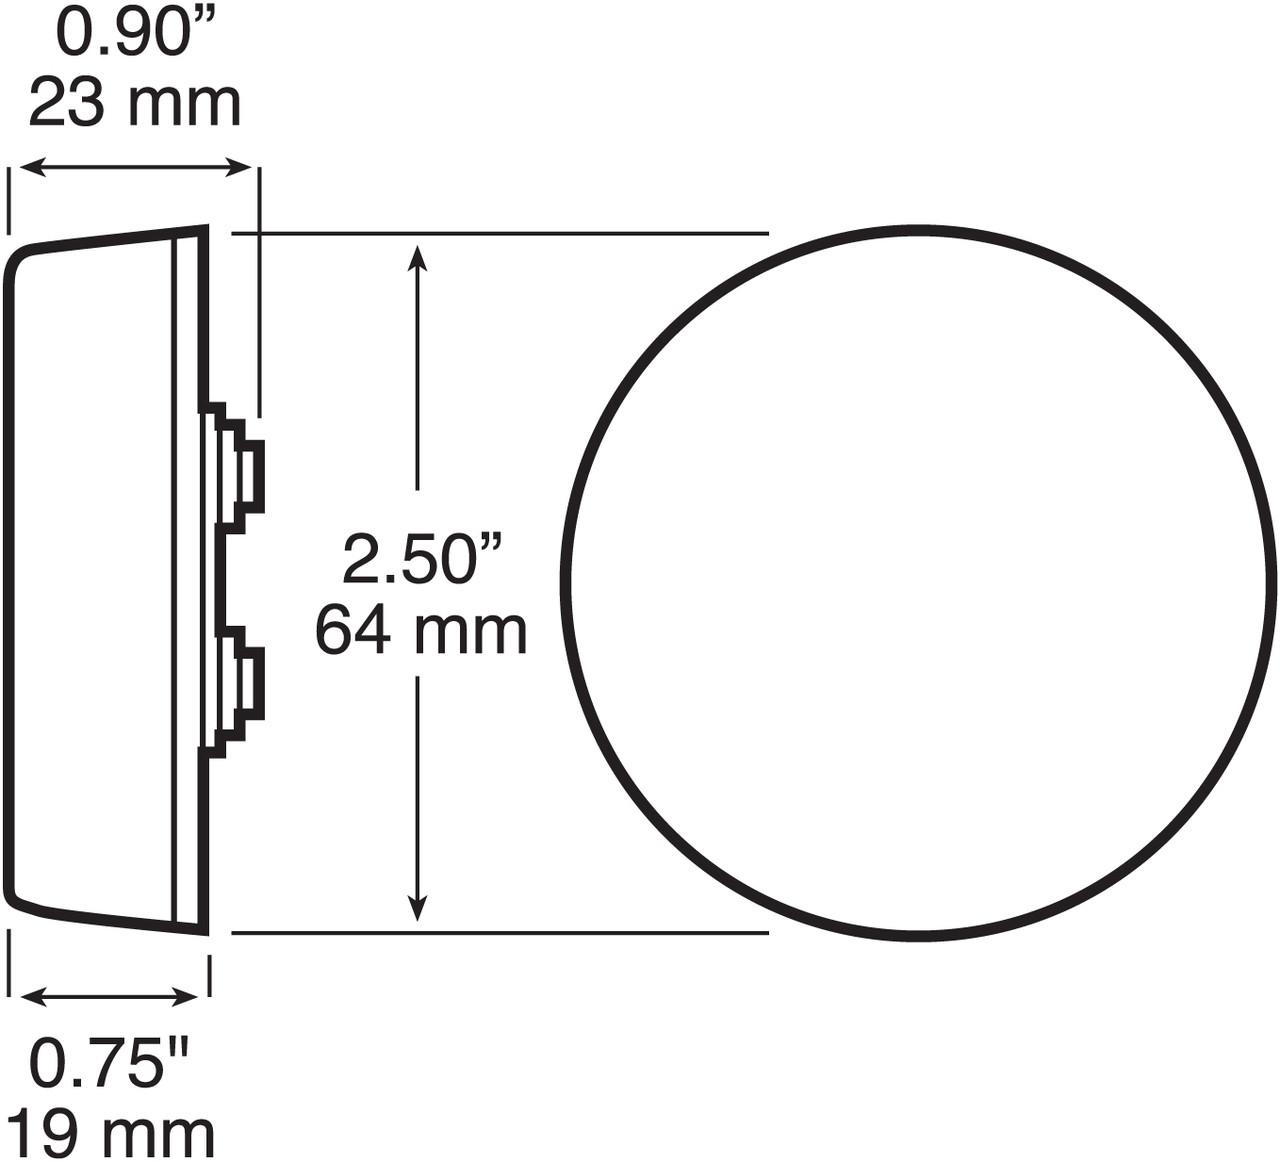 "143KR --- Round 2-1/2"" Sealed Clearance/Side Marker Light Kit"